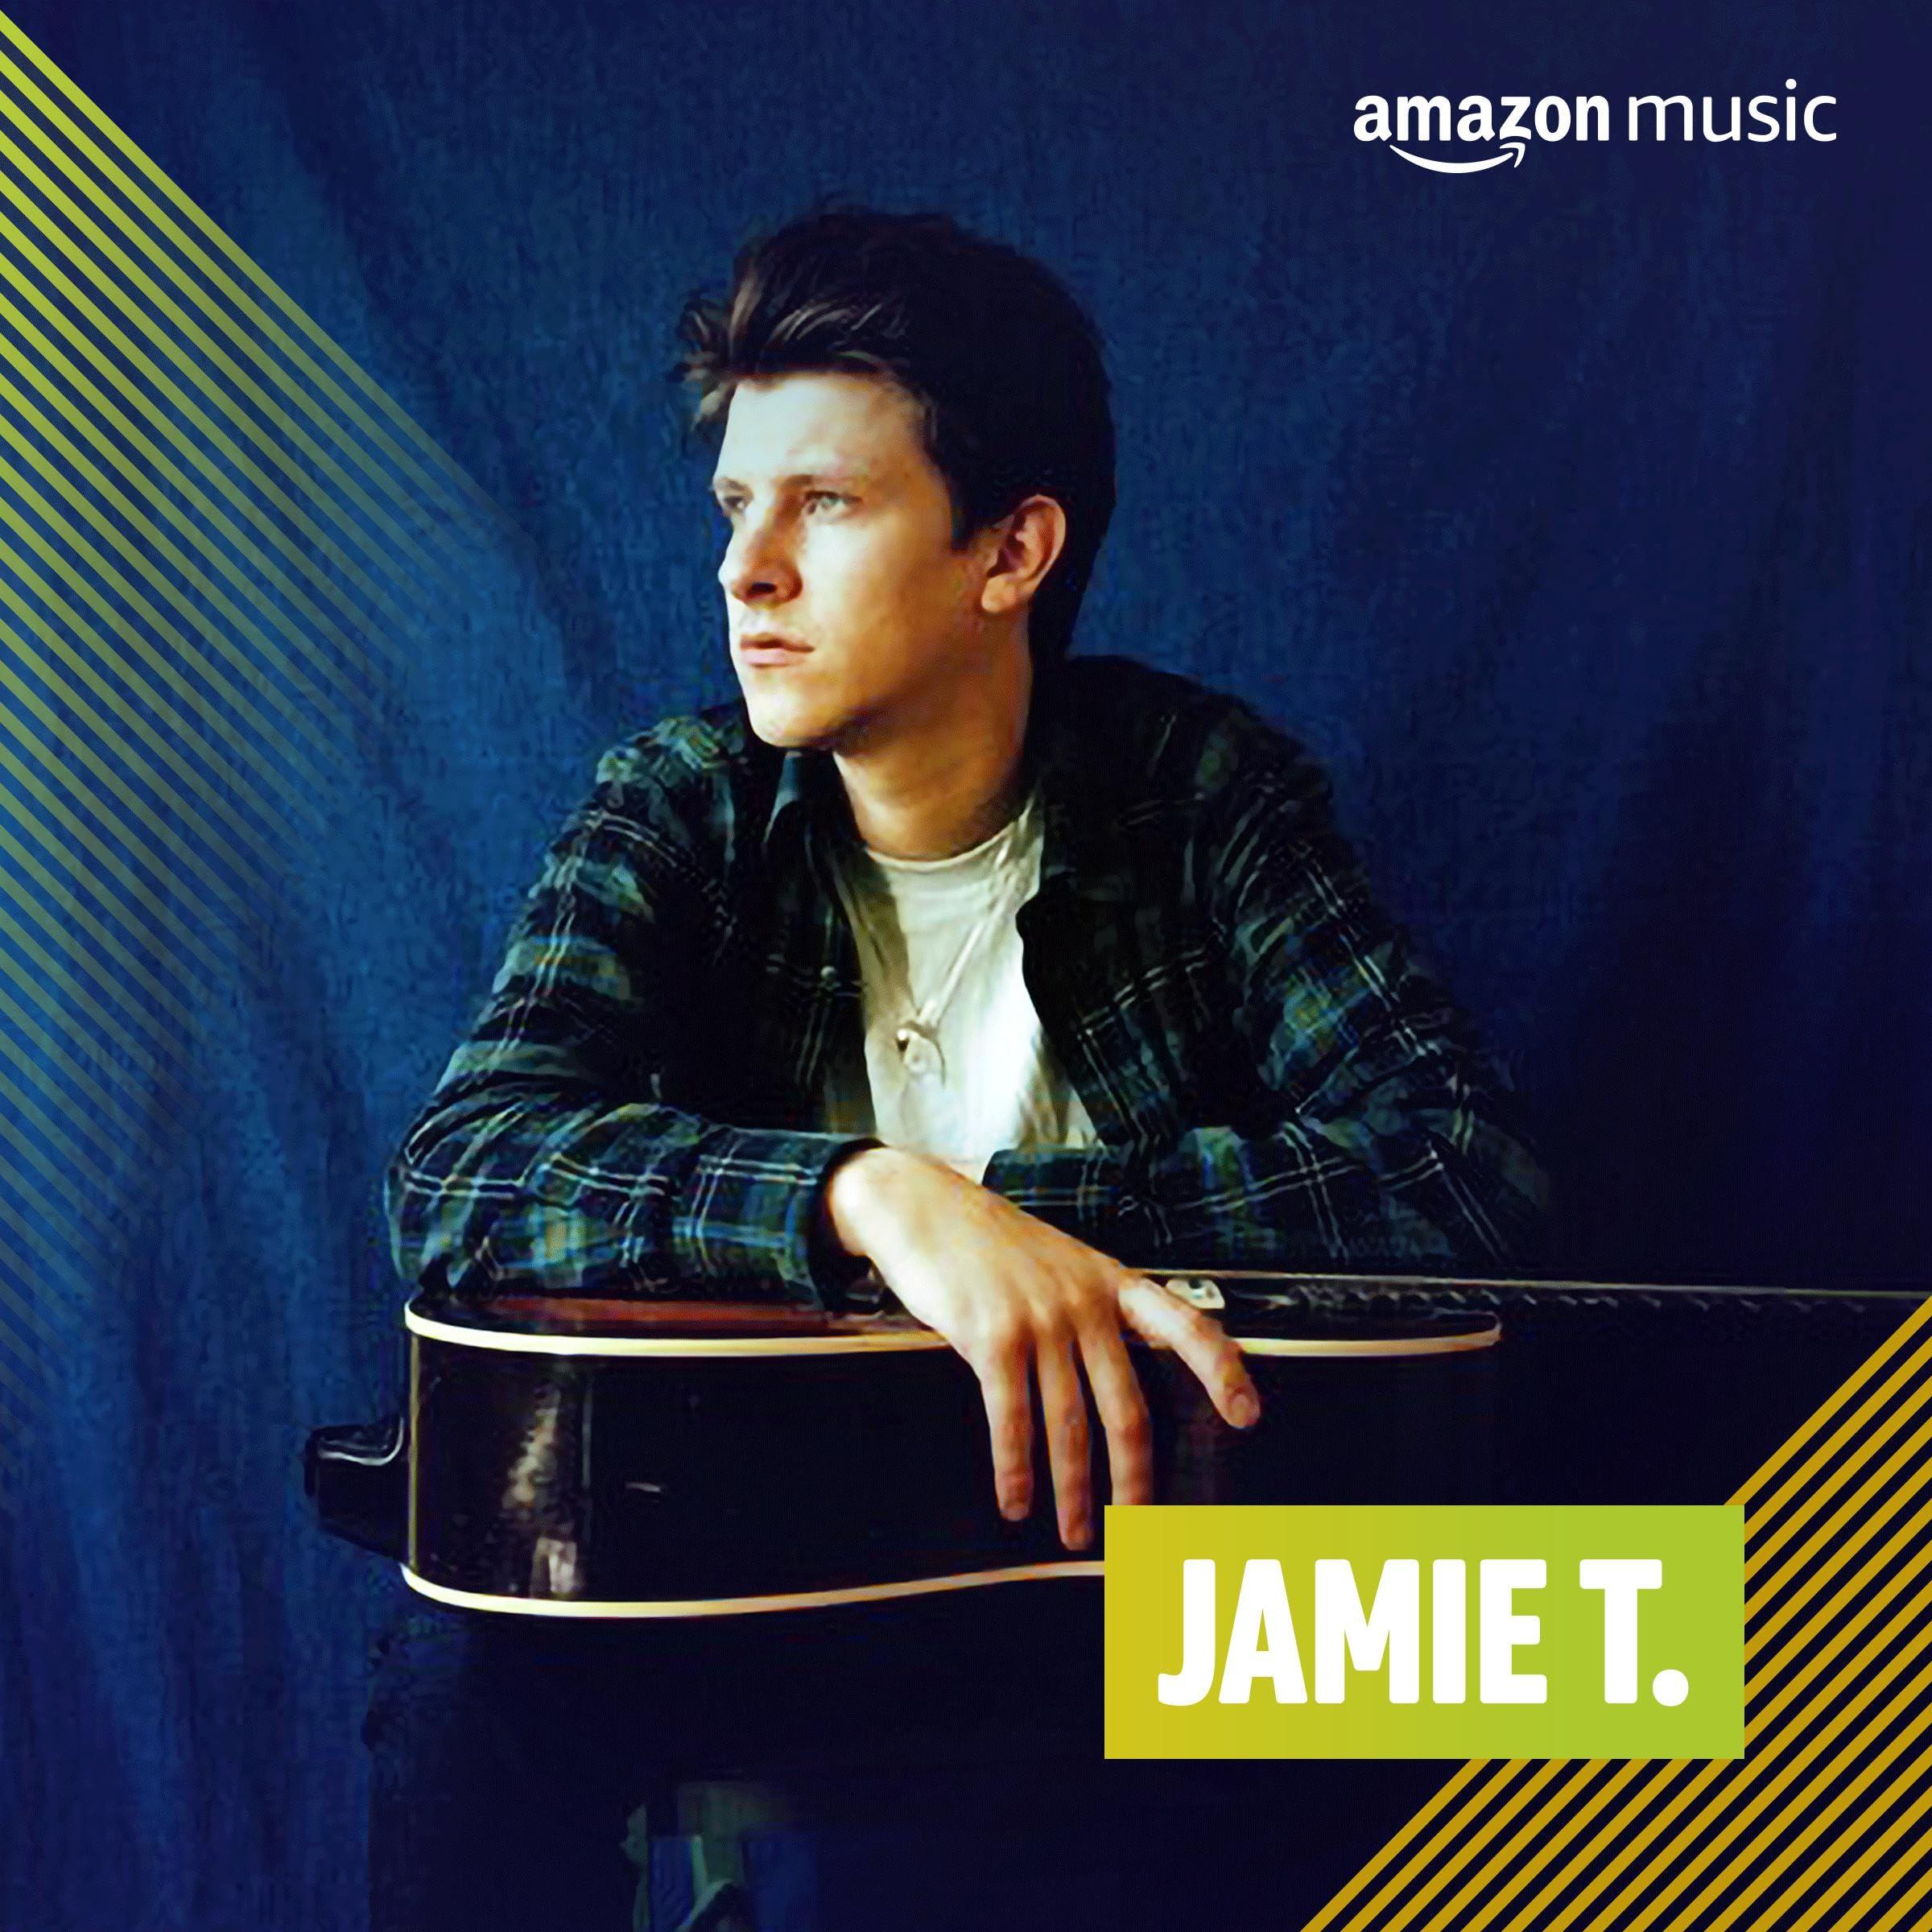 Jamie T.